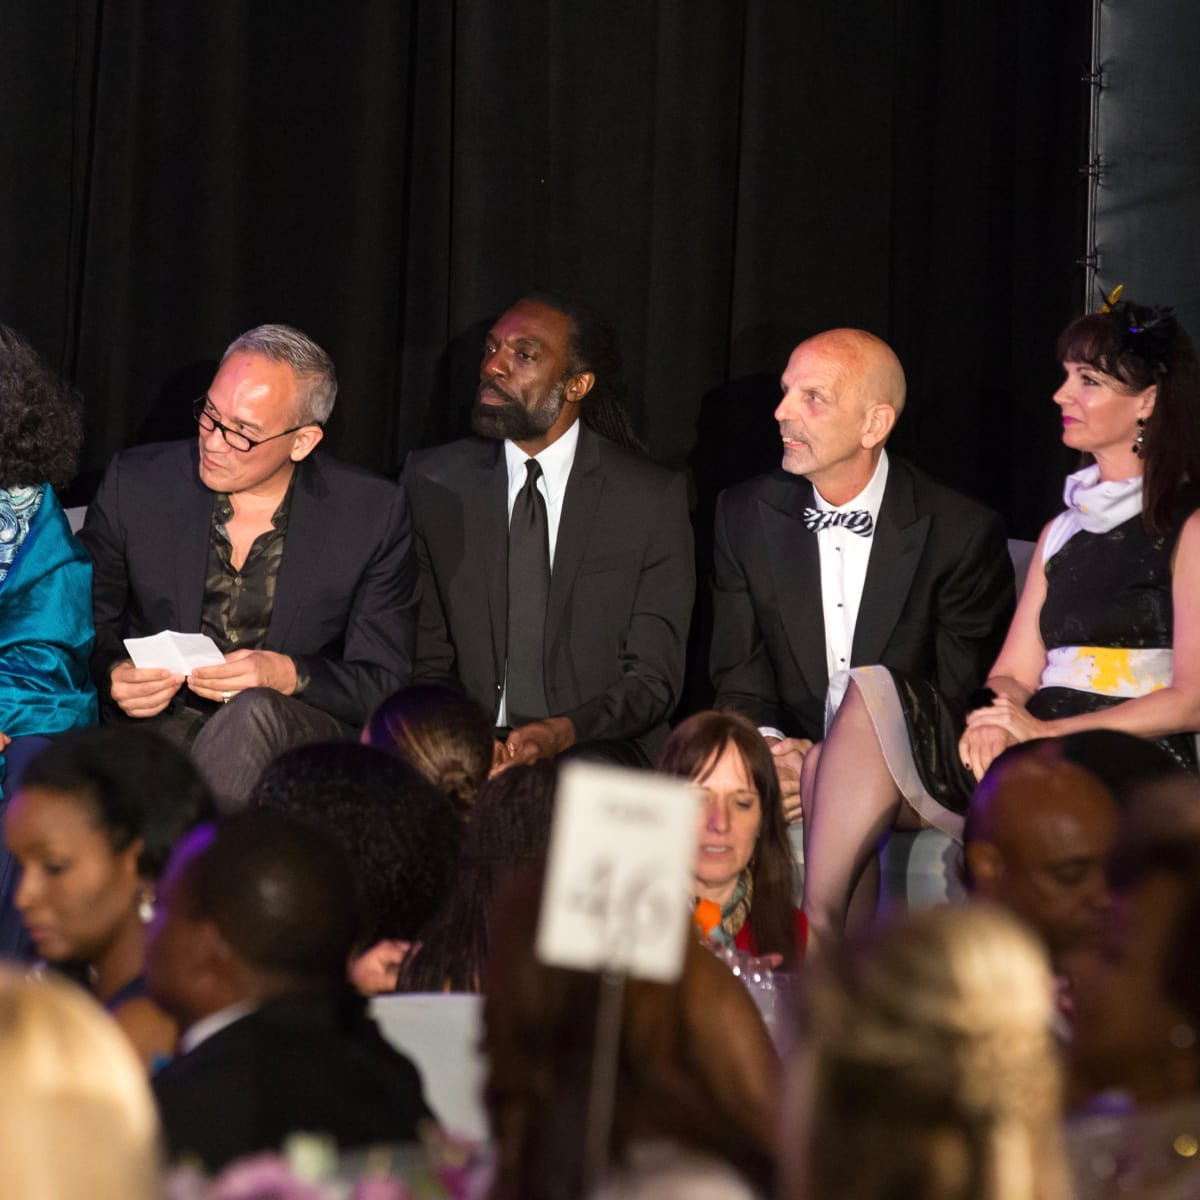 For The Sake of Art judges Michelle Barnes, Cesar Galindo, Kevan Hall, Clifford Pugh, Beth Muenke